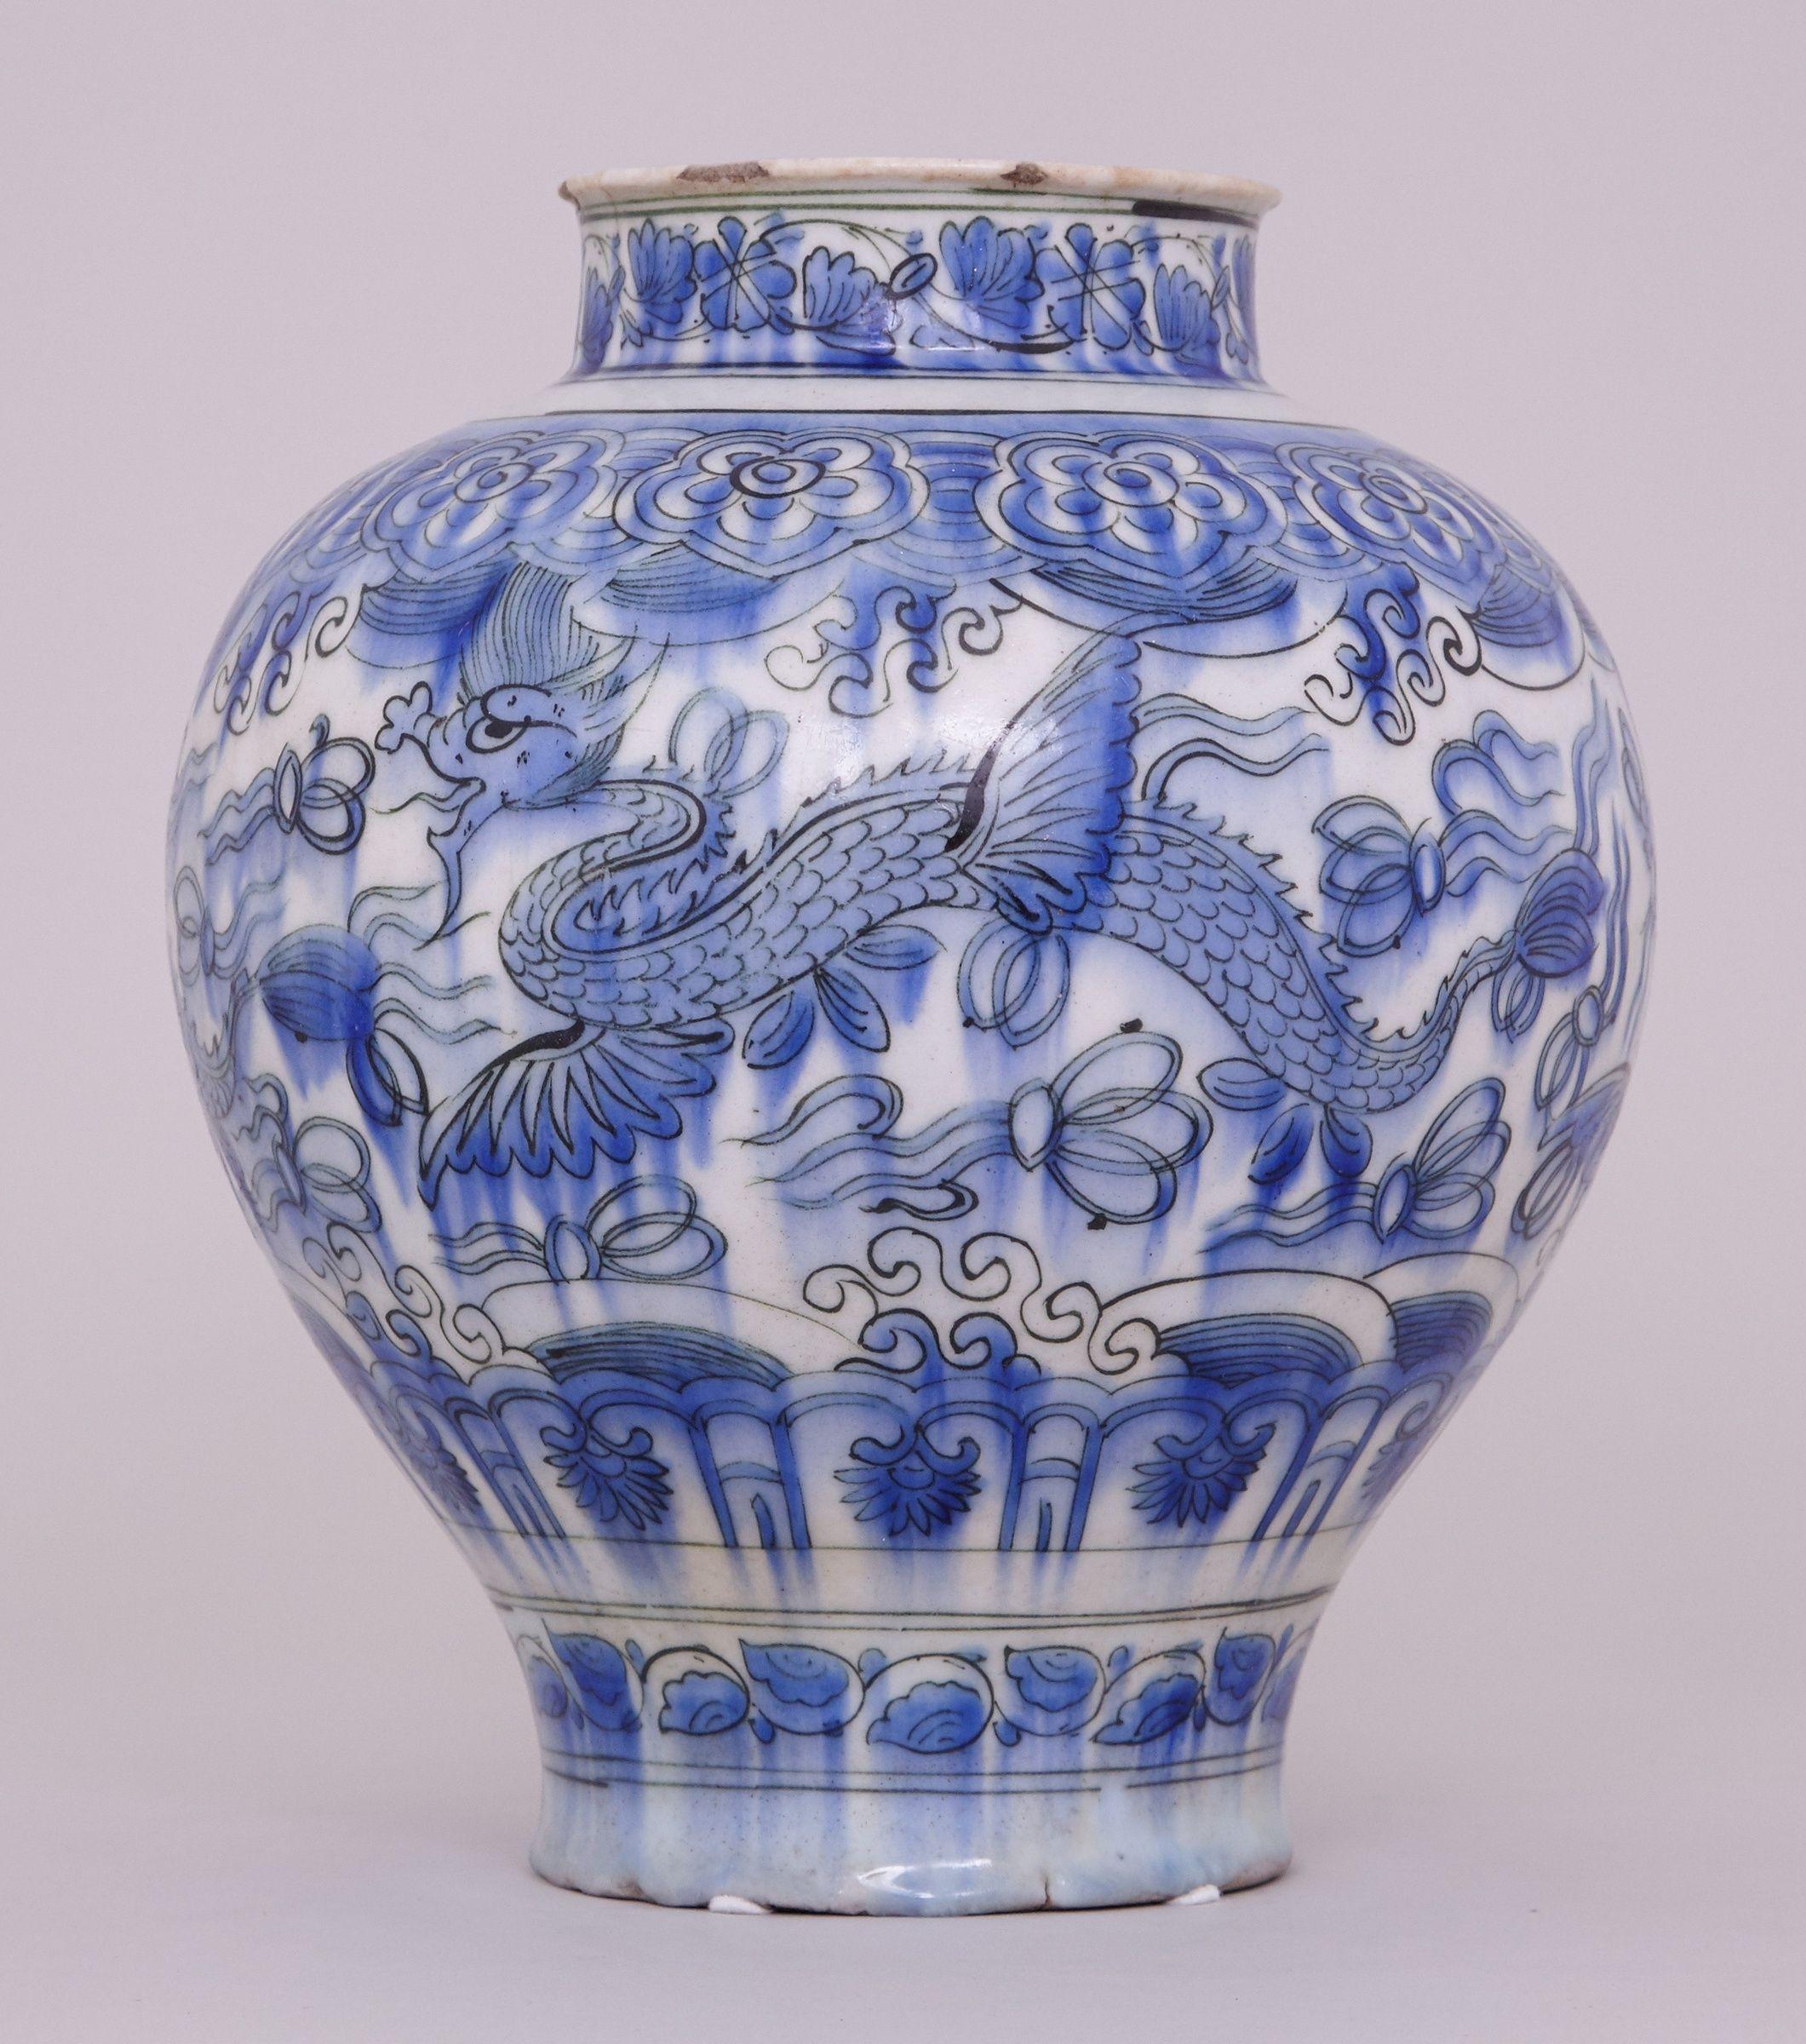 hull cornucopia vase of white pottery vase elegant a blue and white persian safavid jar 17th pertaining to white pottery vase elegant a blue and white persian safavid jar 17th century